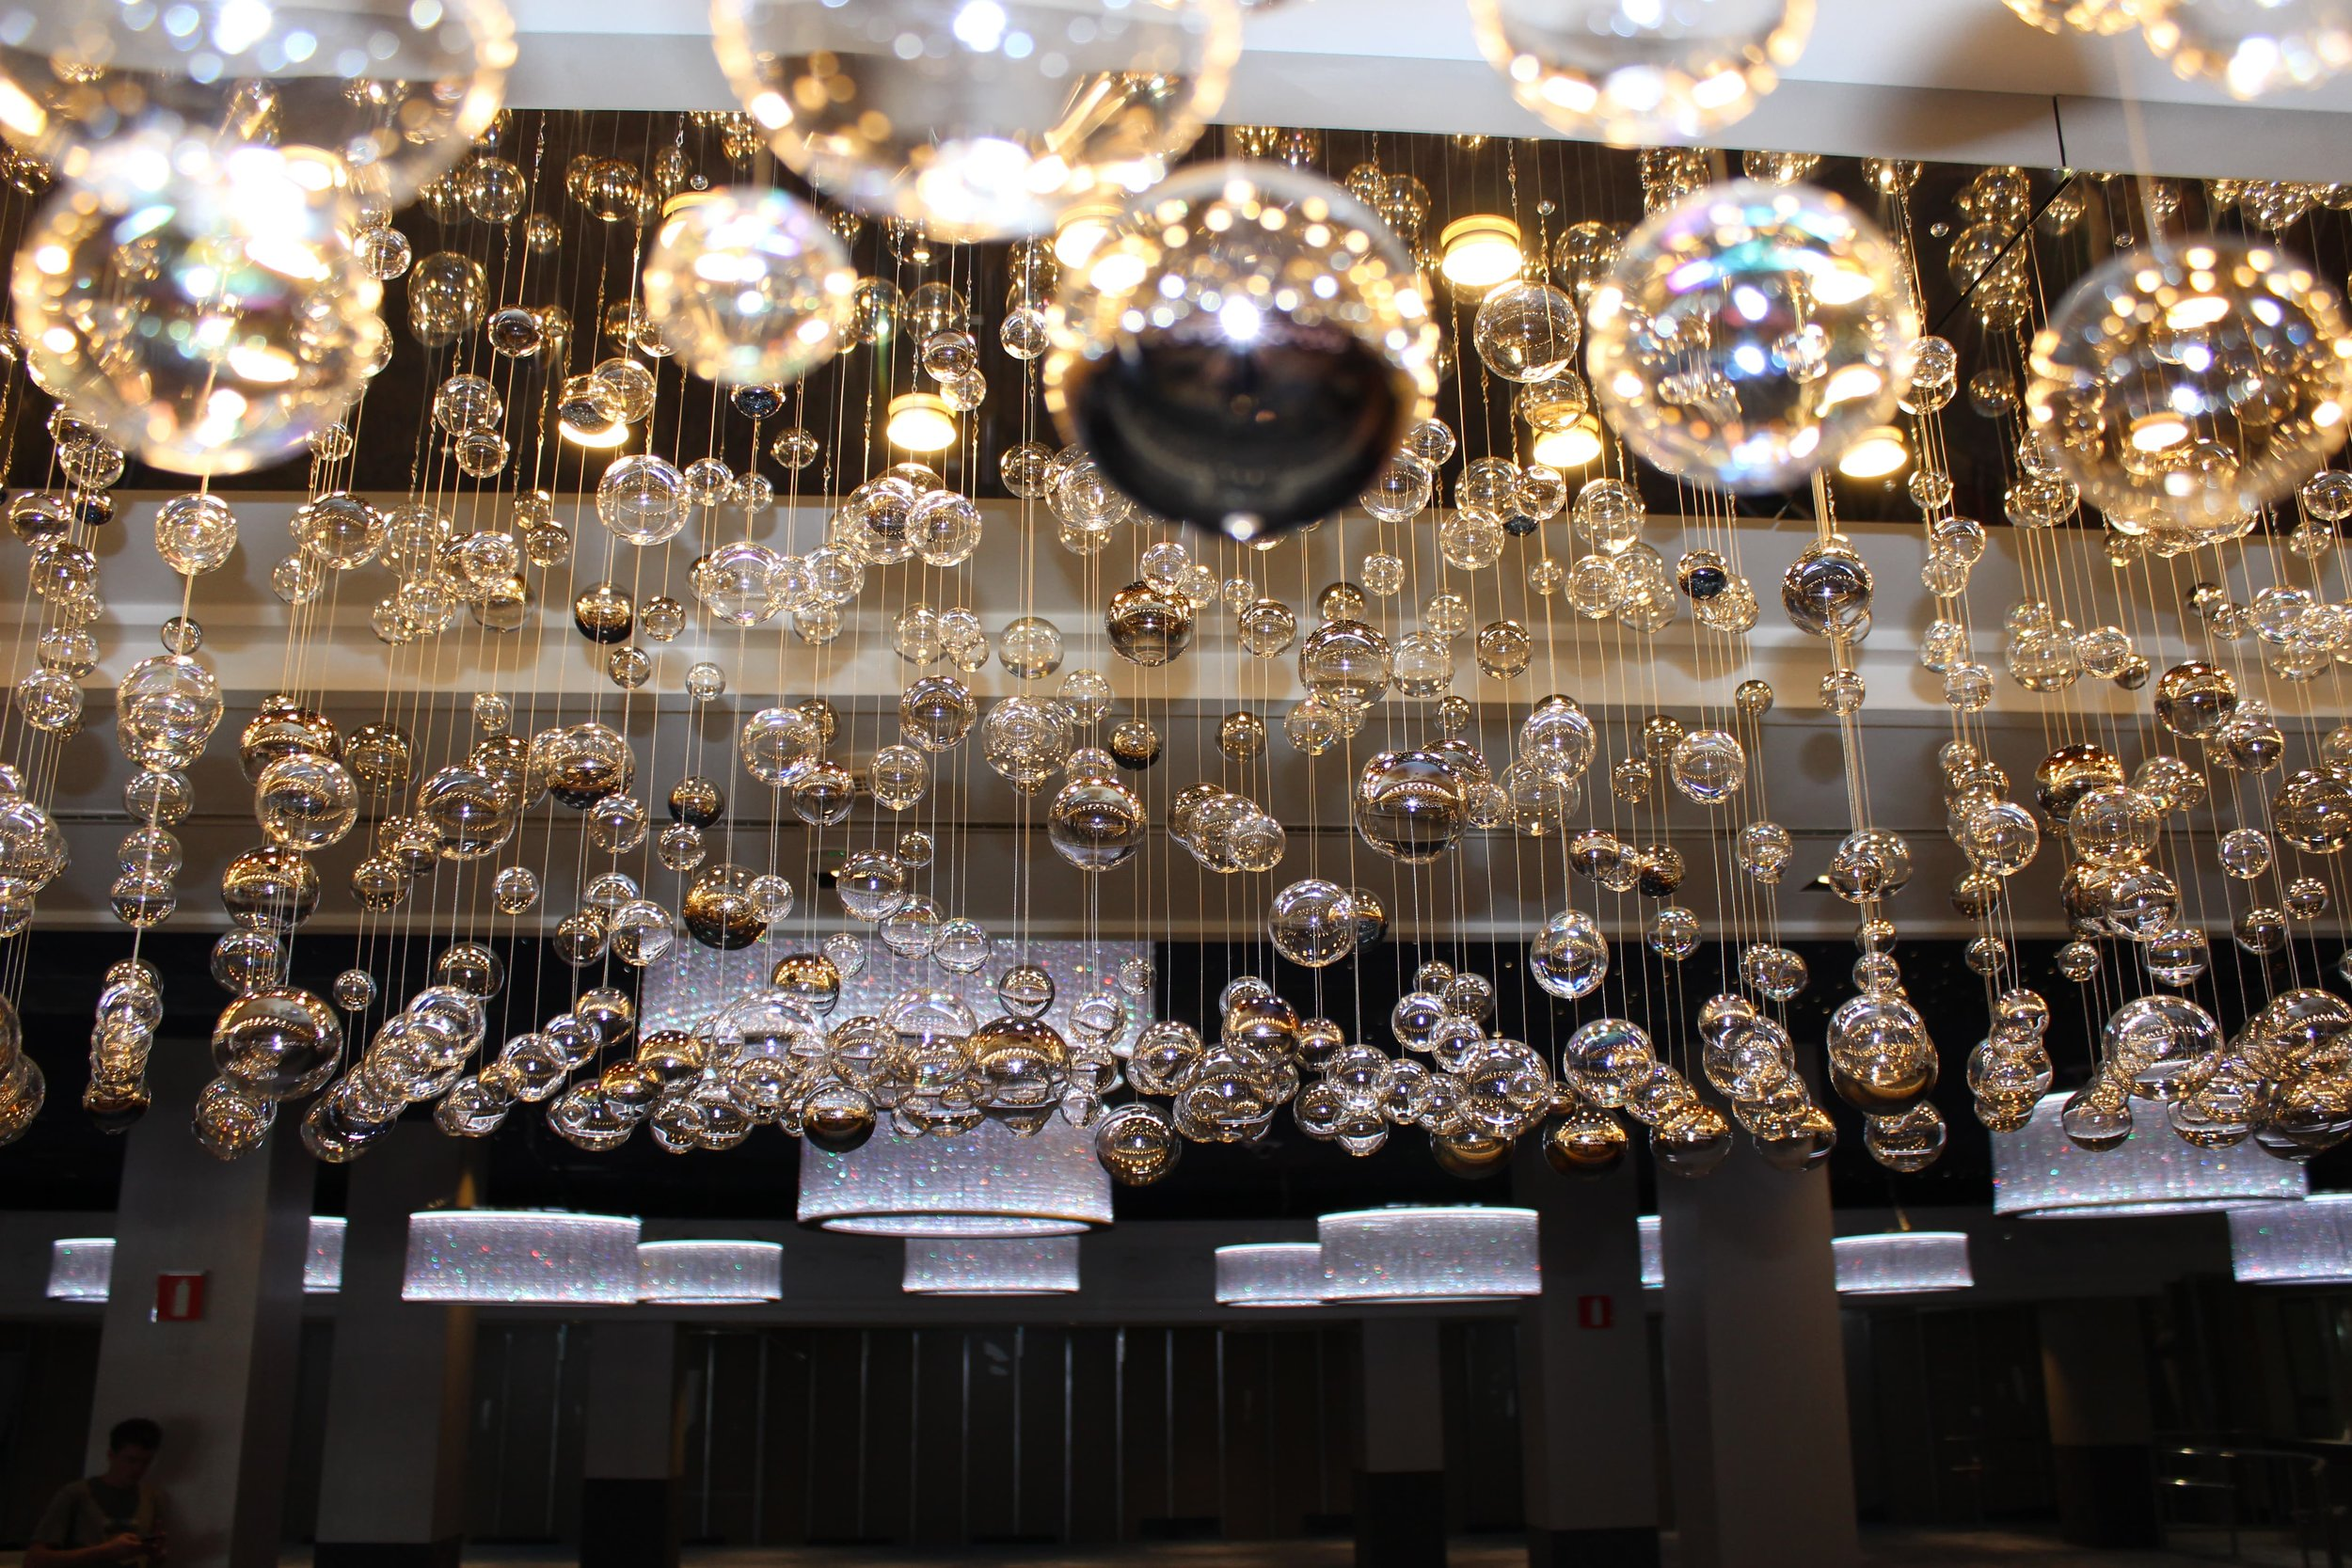 casino-spain-wranovsky-crystal-chandeliers-4.JPG